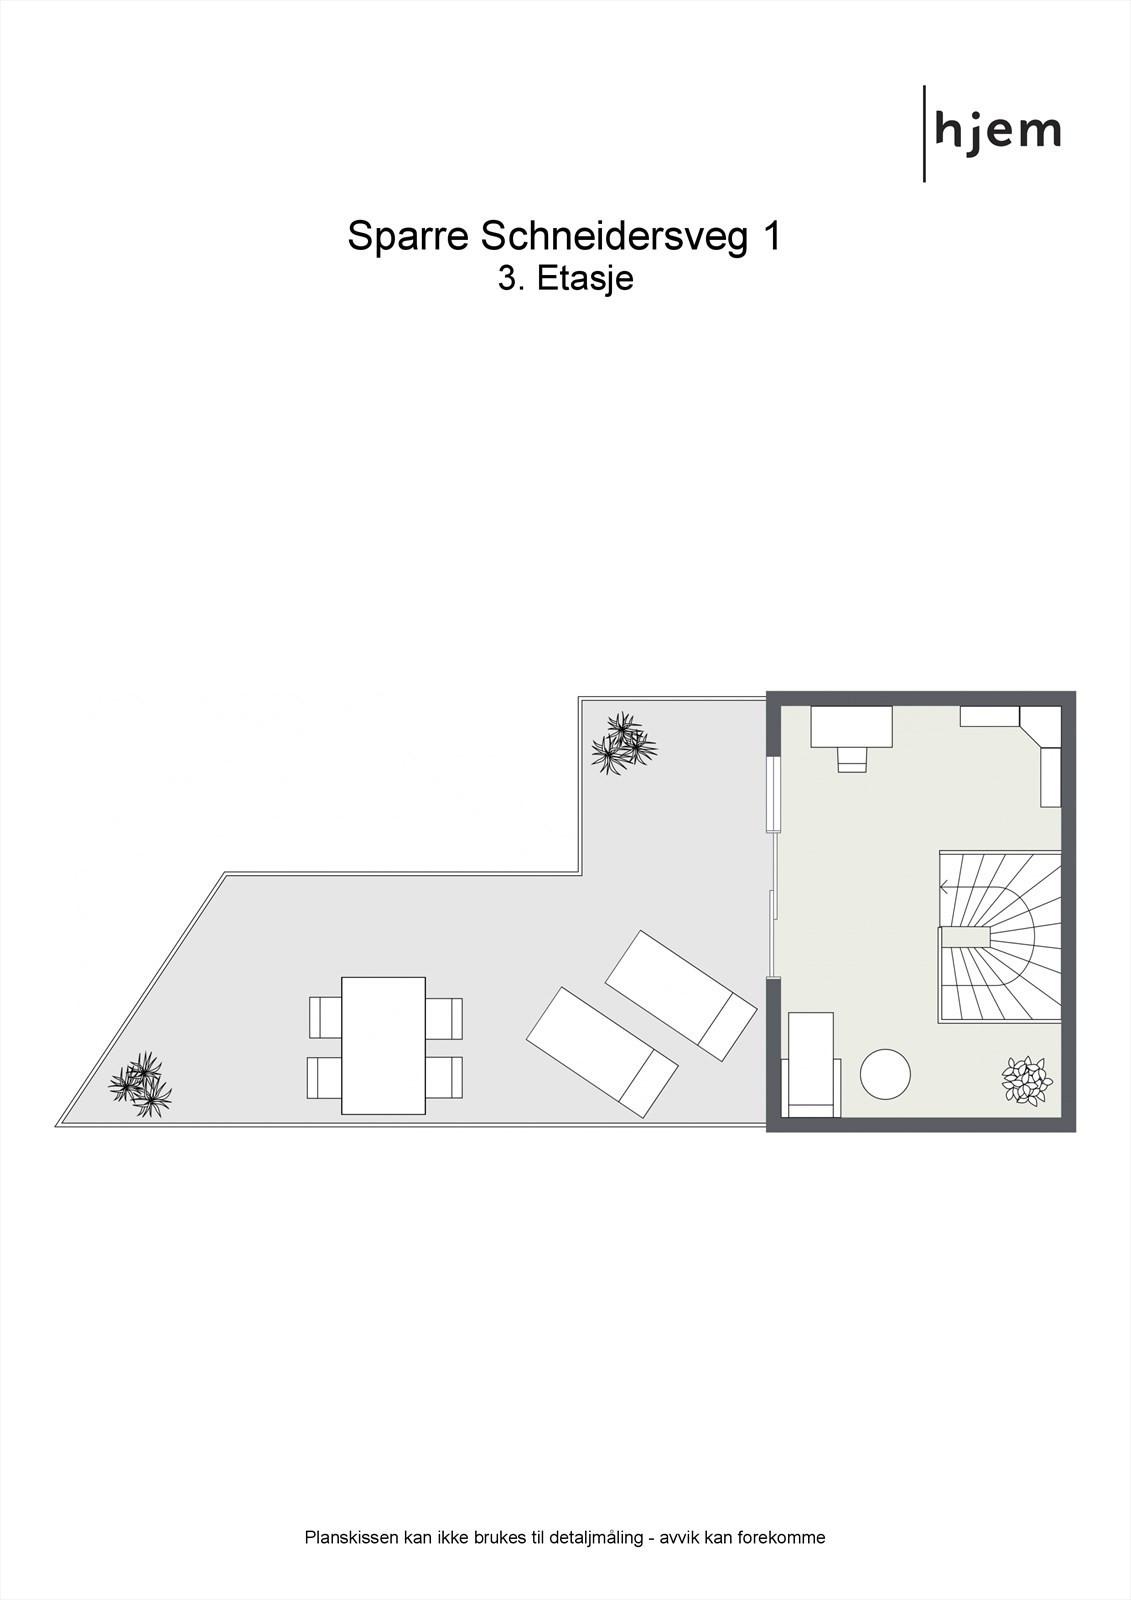 Planløsning 3. etasje